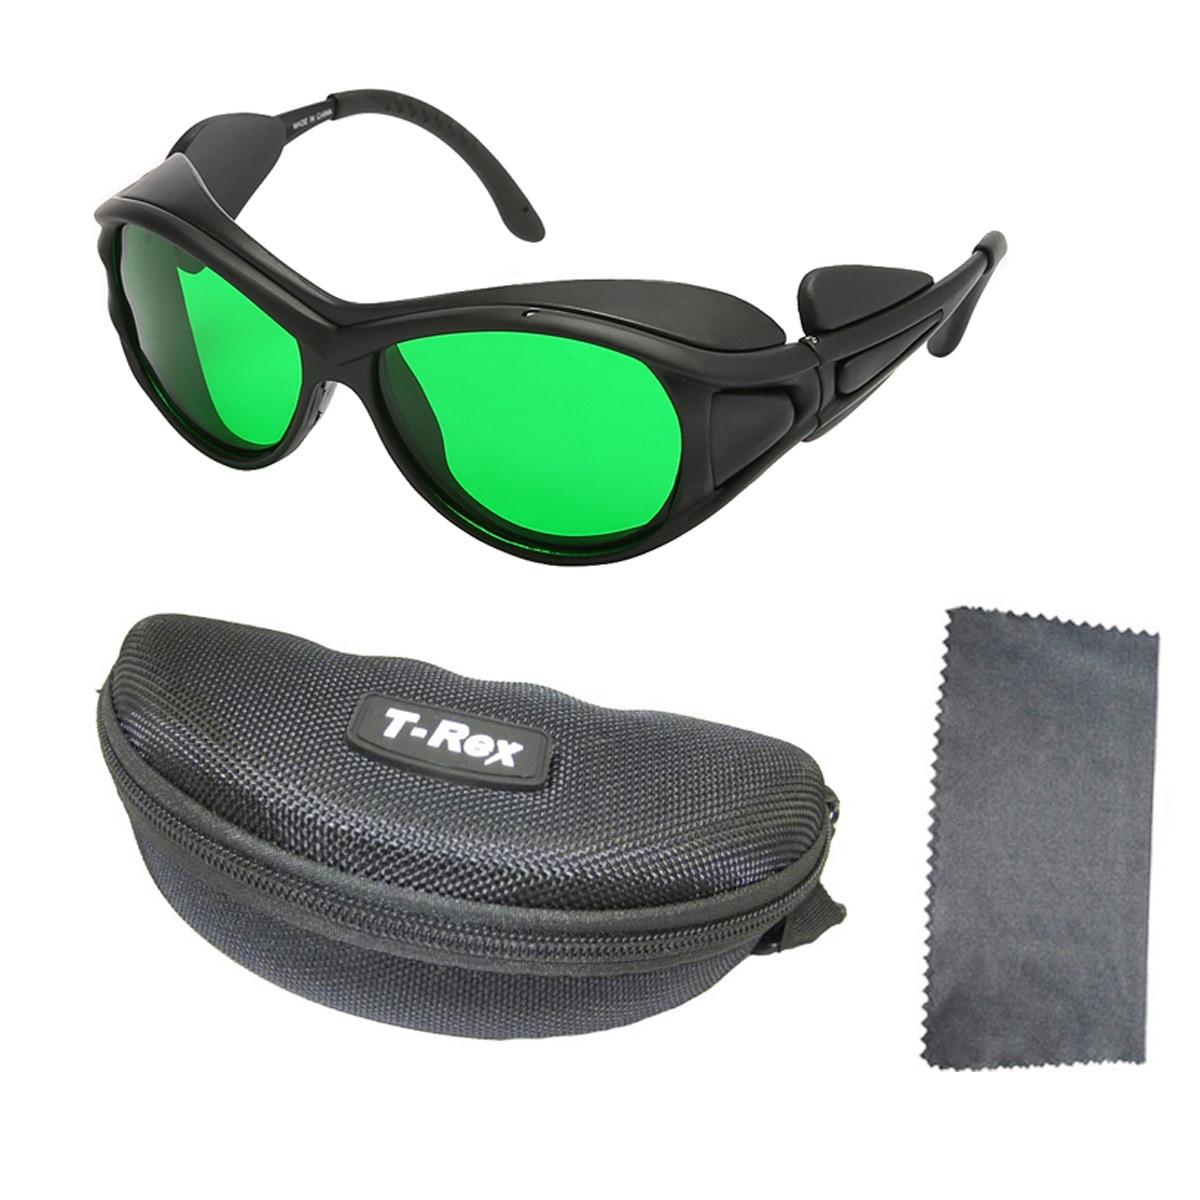 He-Ne-نظارات واقية من الضوء الأحمر ، نظارات واقية من الأشعة فوق البنفسجية شبه الموصلة بالليزر 600-700nm LED